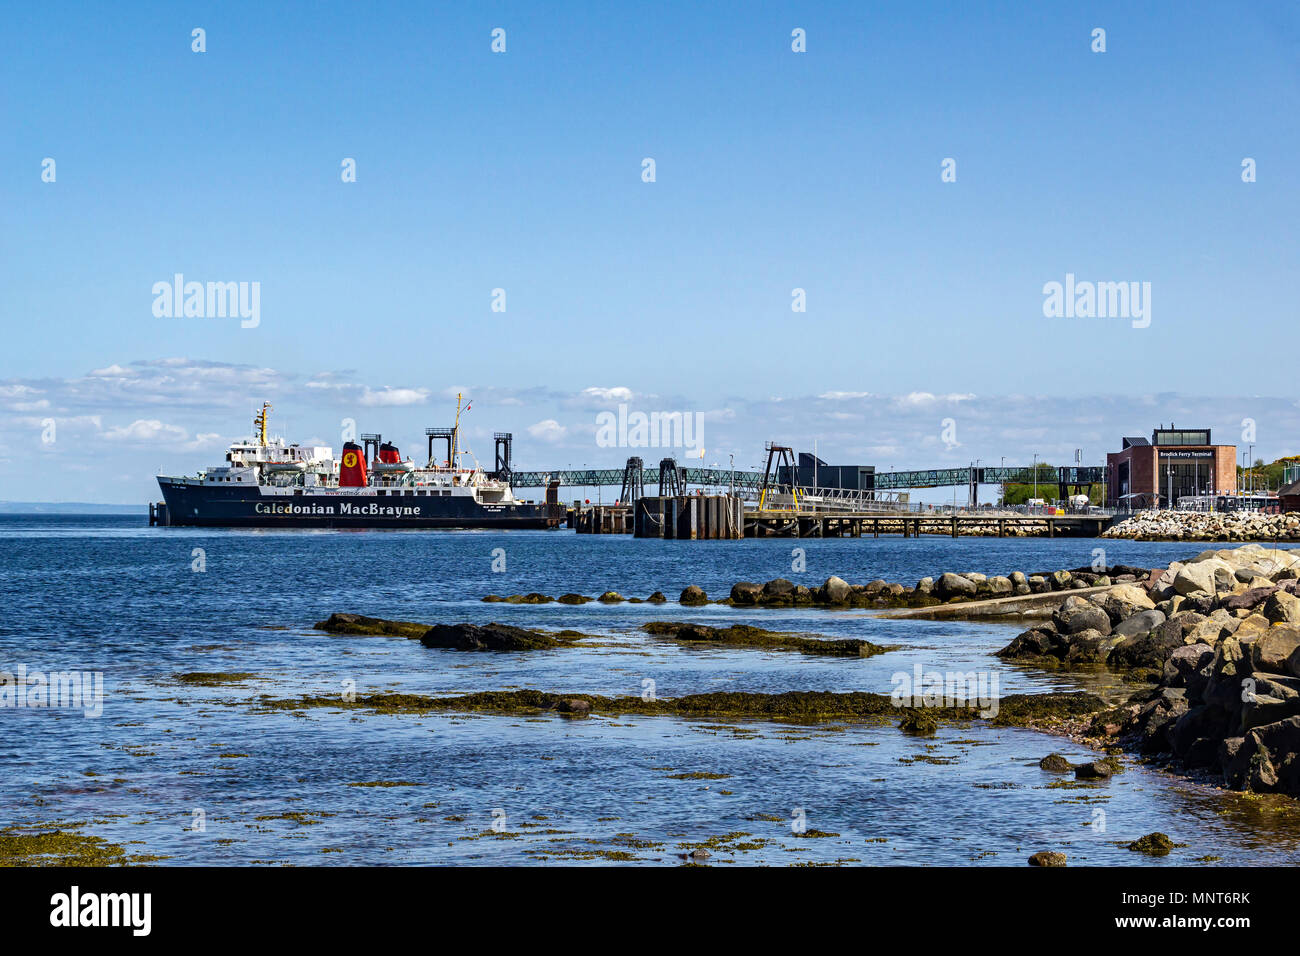 CalMac car and passenger ferry Isle of Arran at the new Caledonian MacBrayne ferry terminal in Brodick Isle of Arran Scotland UK - Stock Image